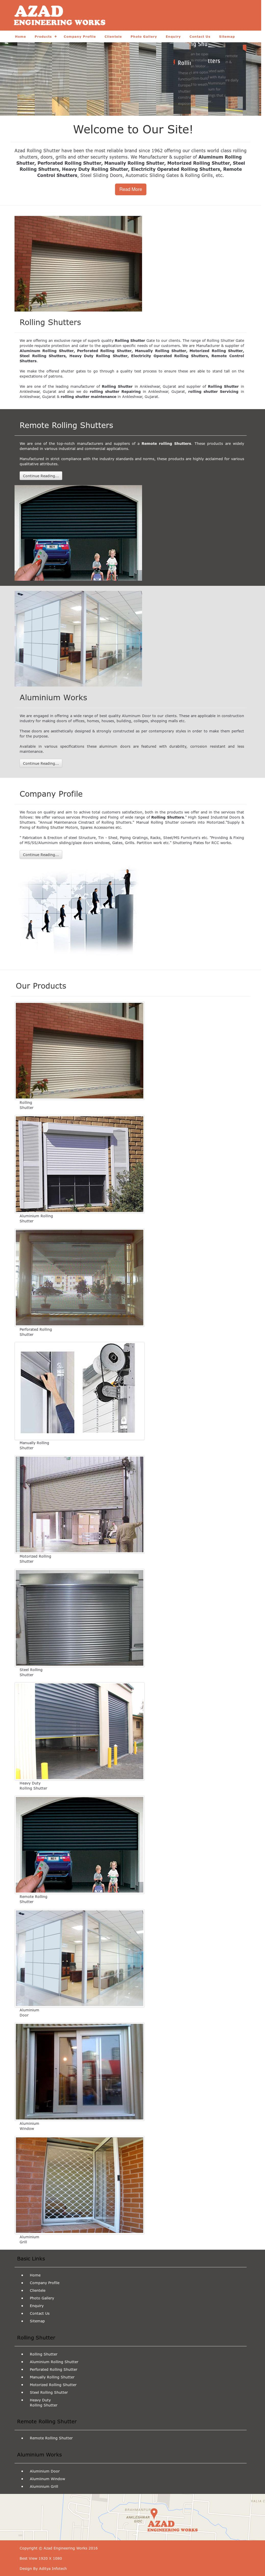 Aluminium Sliding Doors Ings on